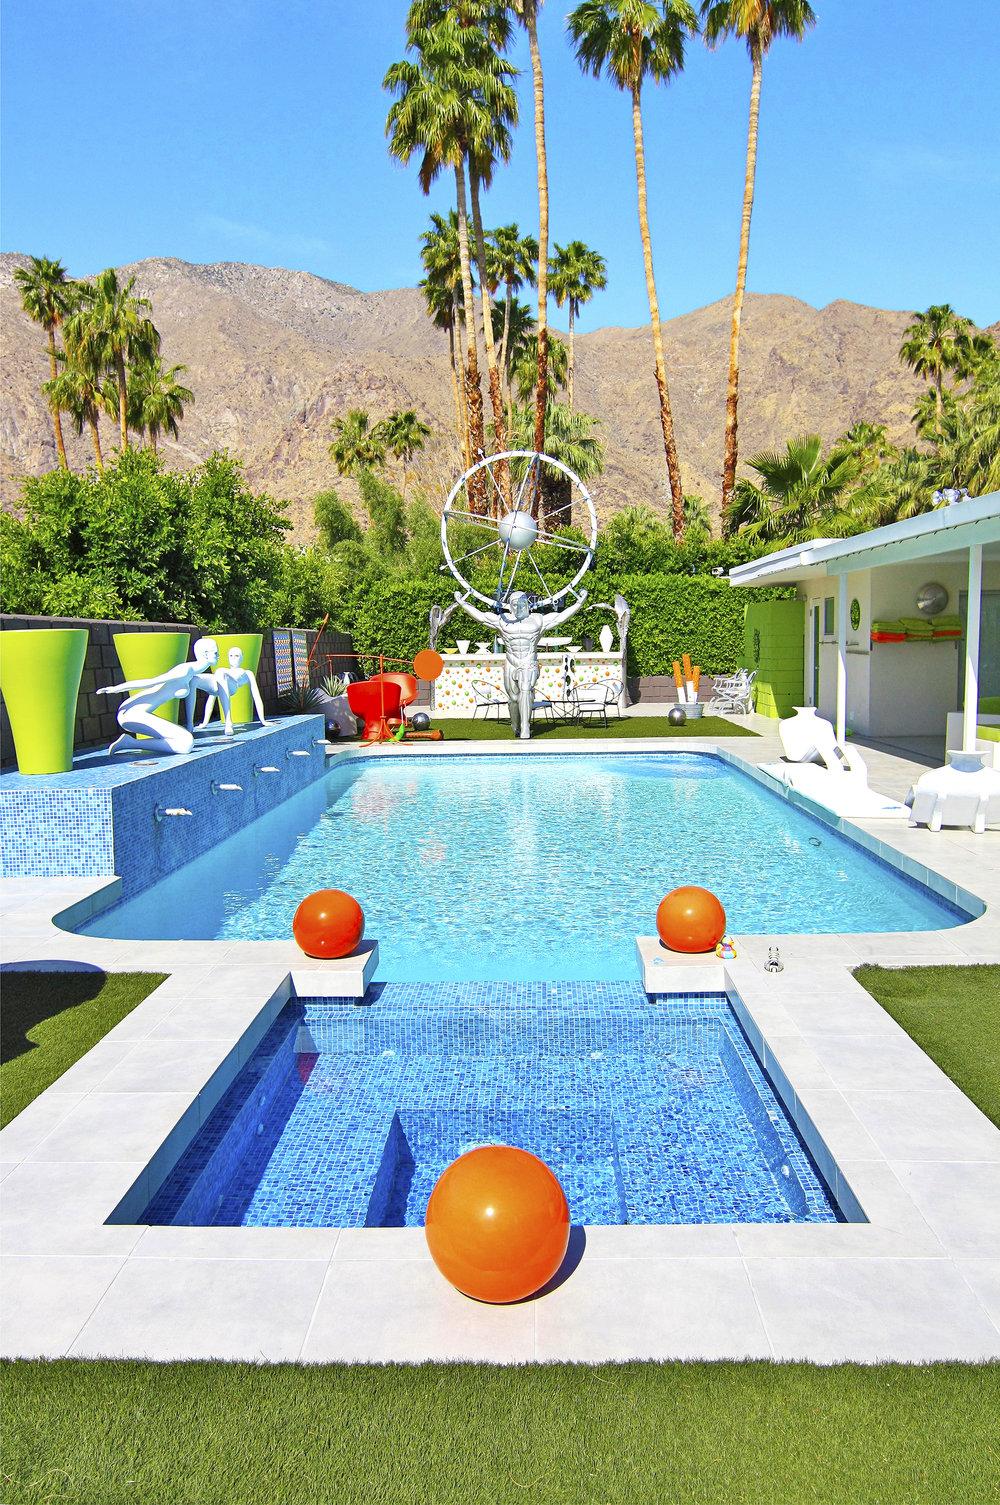 6 DollyFaibyshev_Leisure Land (from the series Palm Springs)_2010_Digital C-Print_$1200.jpg